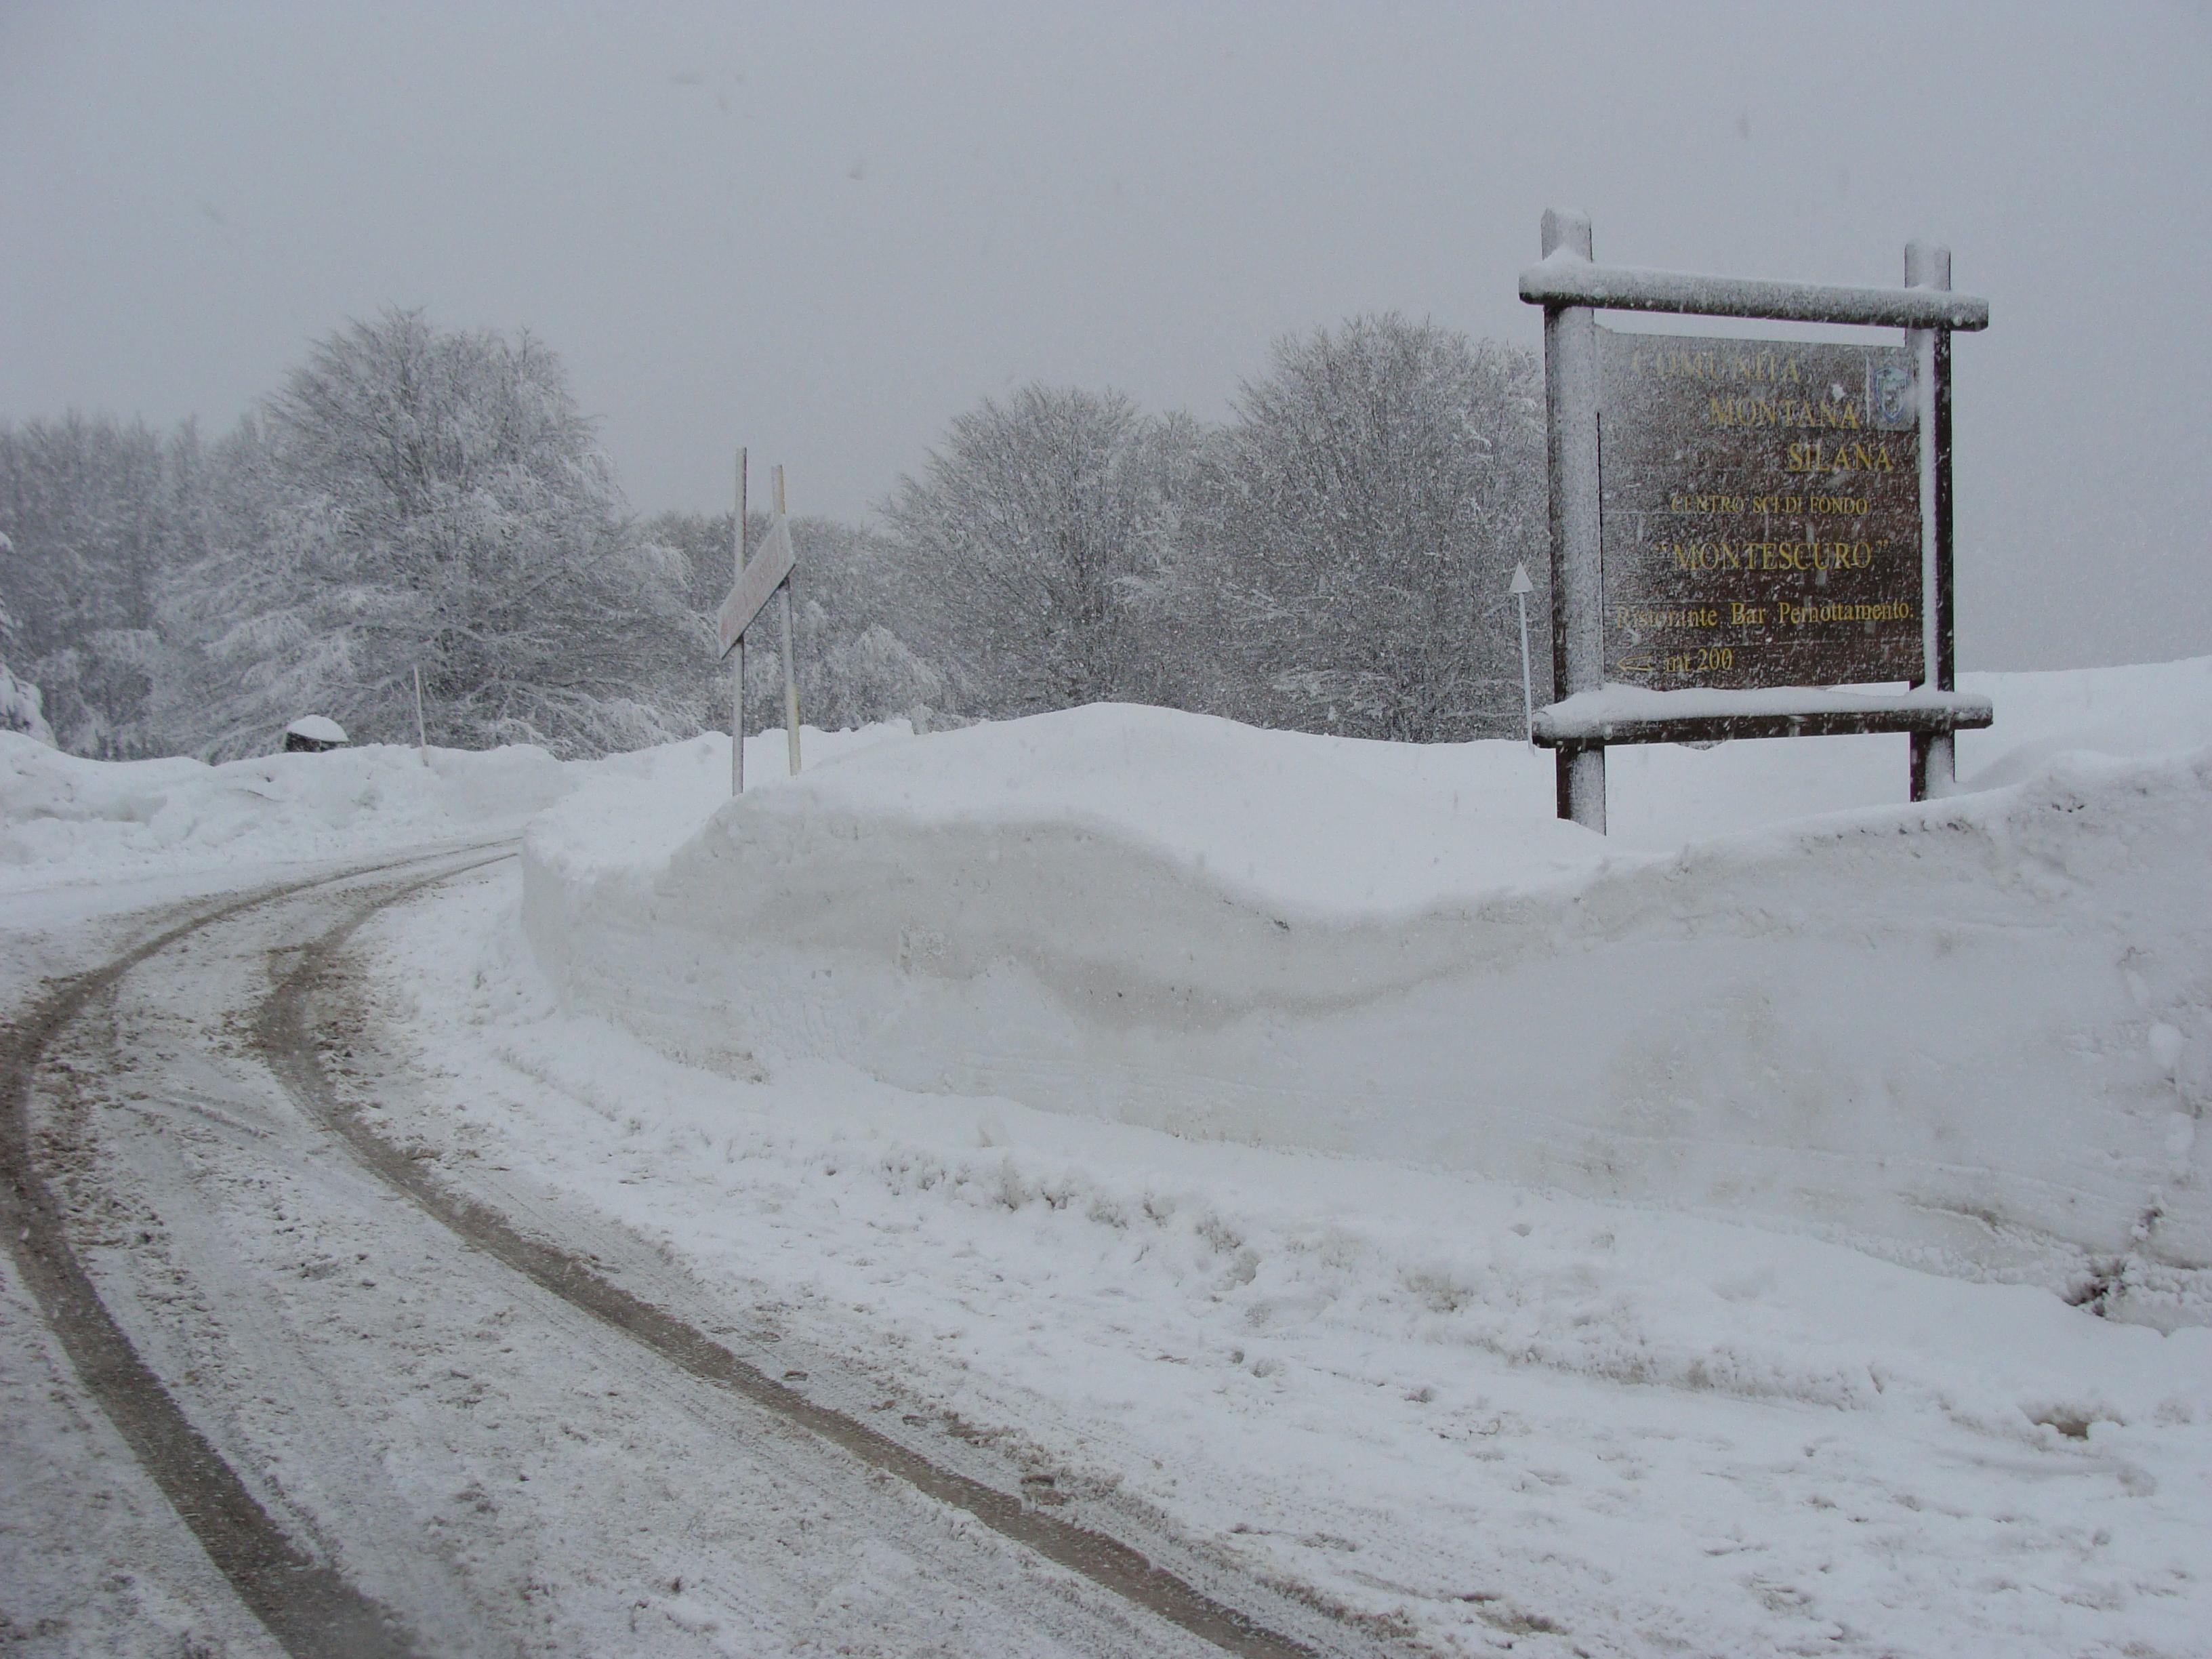 Weekend Artico: arrivano freddo e neve!